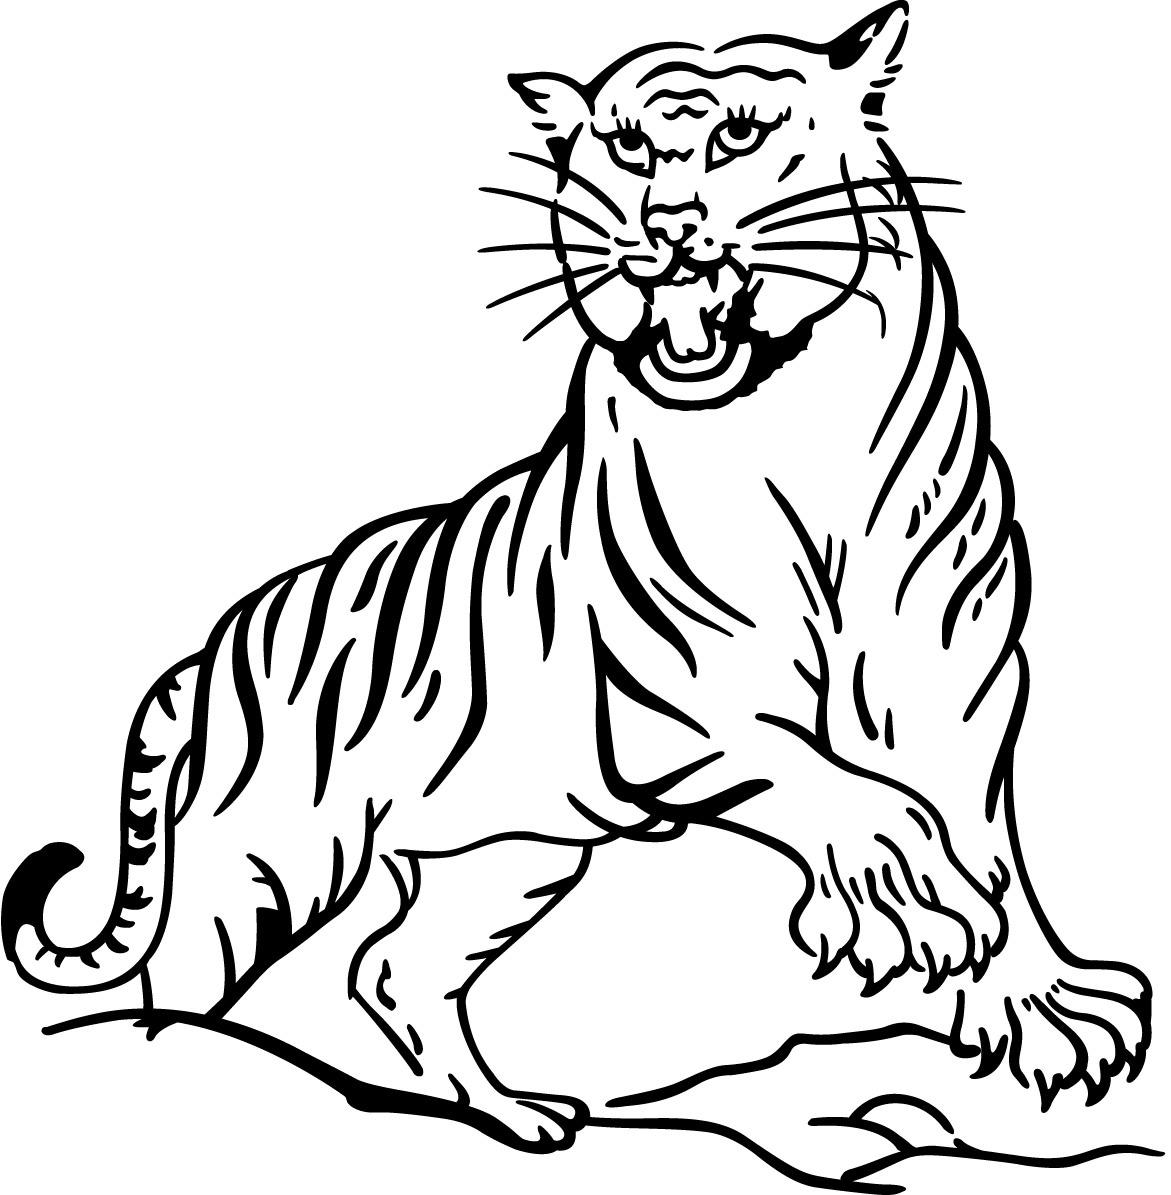 tiger coloring page free printable tiger coloring pages for kids coloring tiger page 1 1